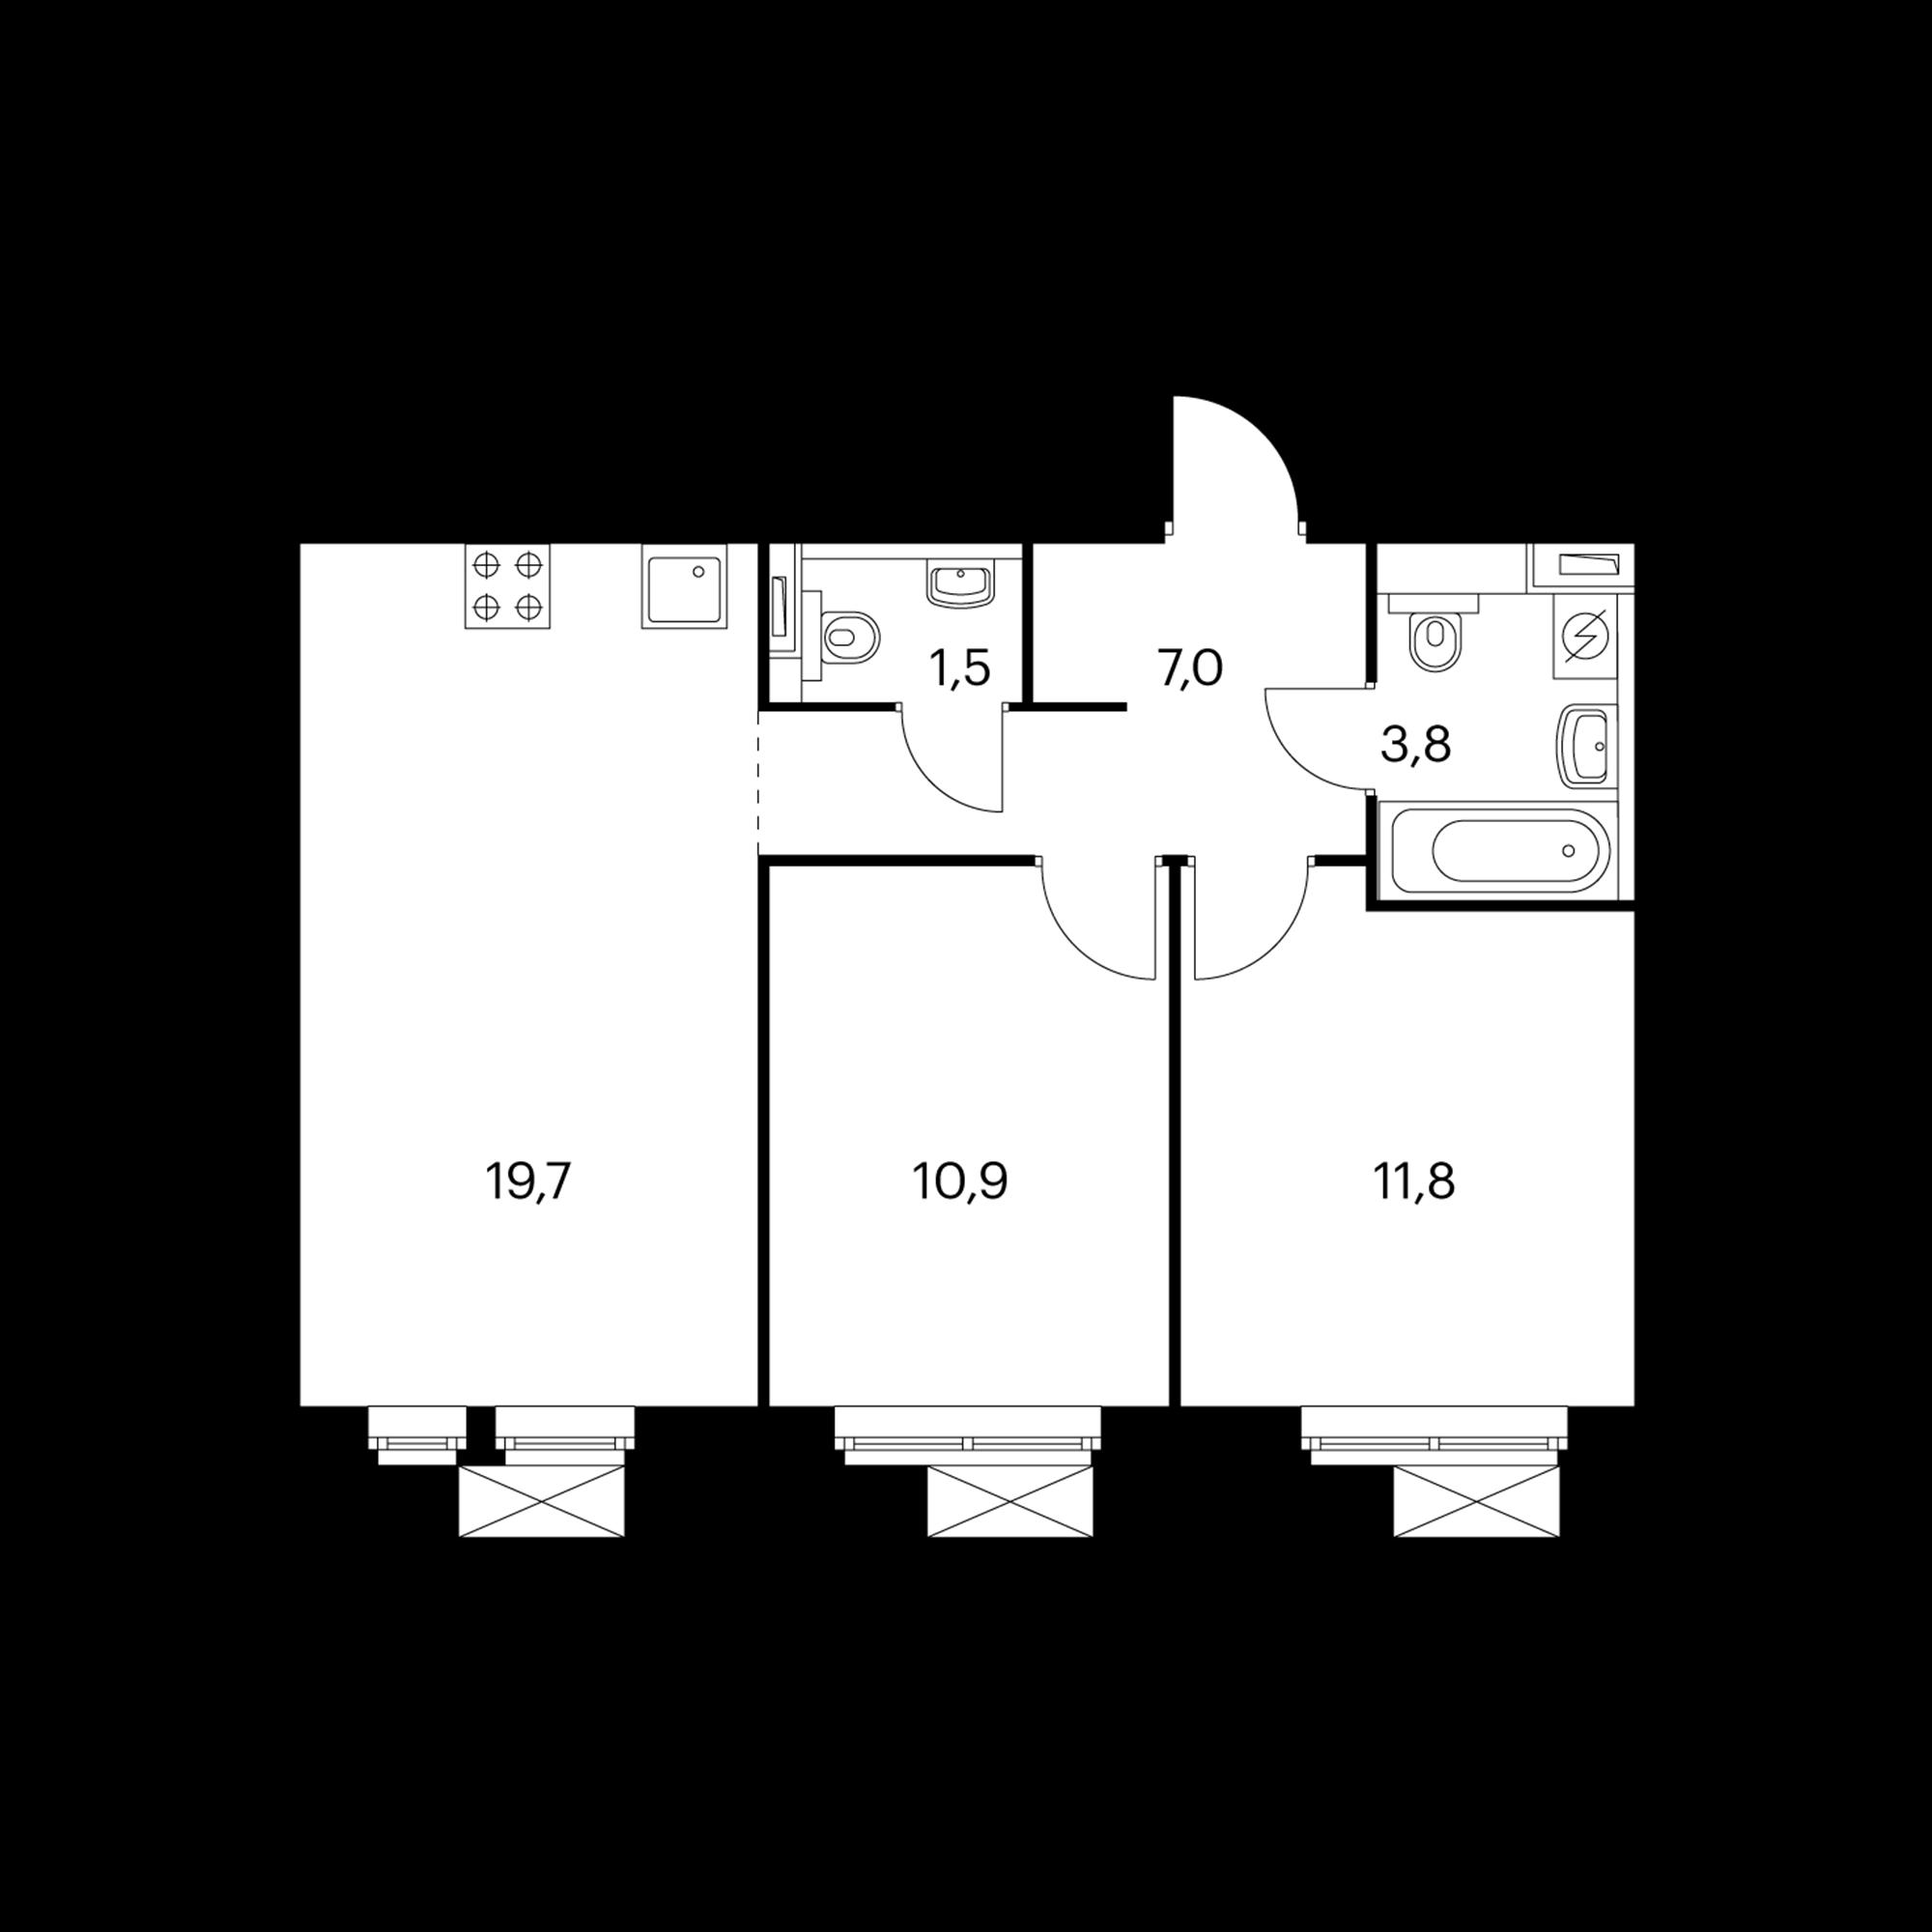 2ES8_9.6-1_S_Z2